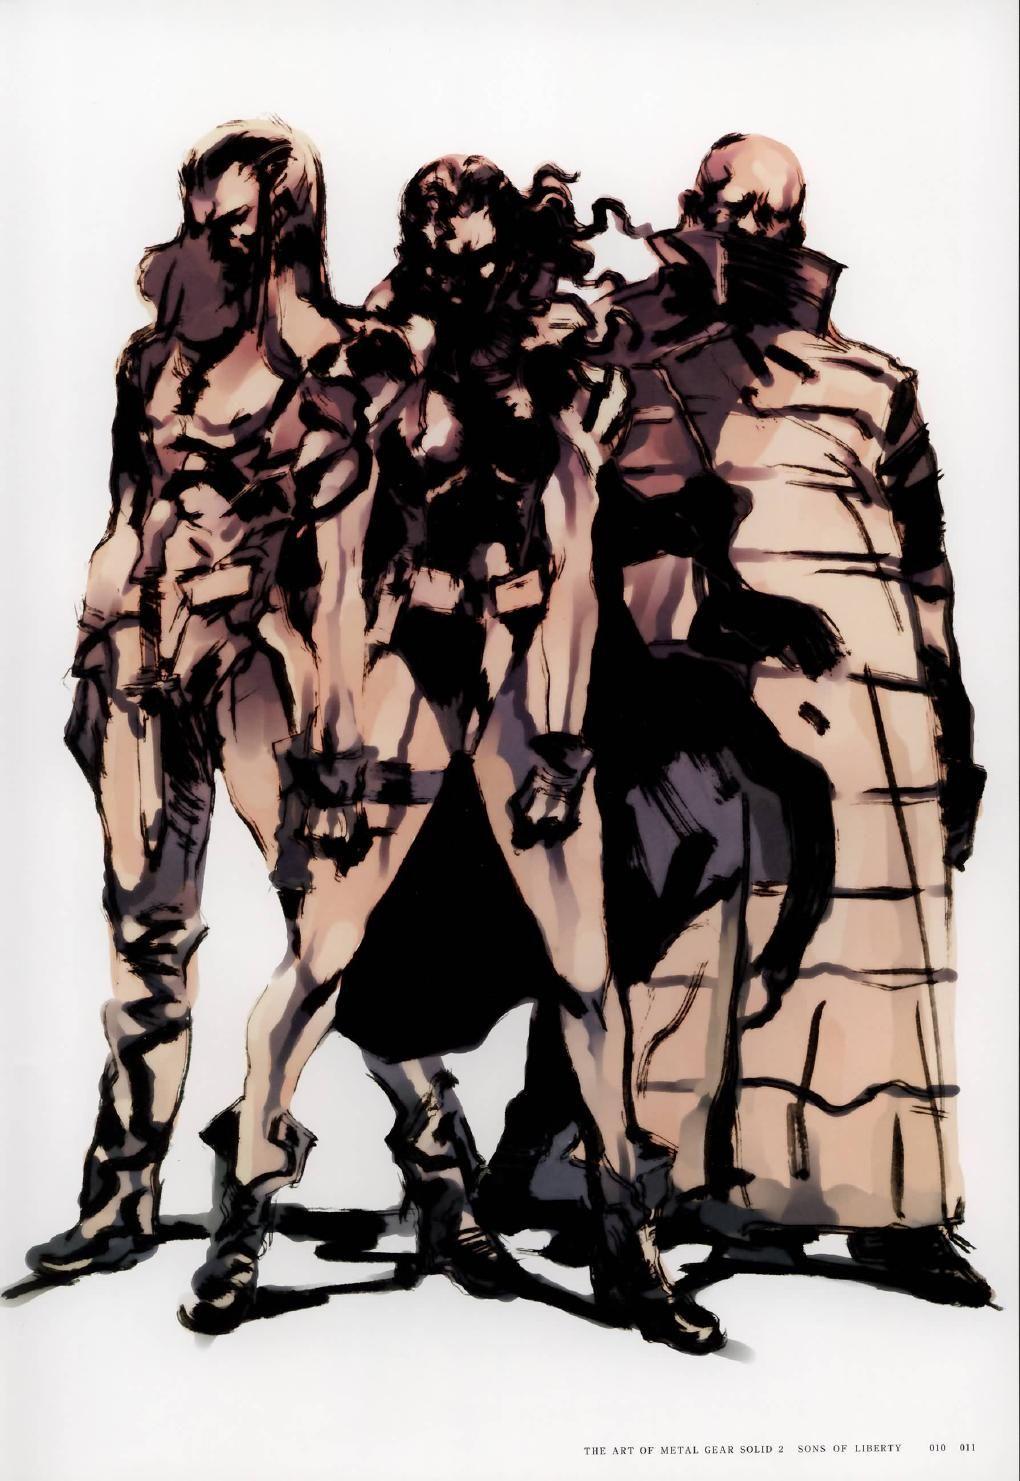 Metal Gear Solid 2 Concept Art - Dead Cell Concept Art